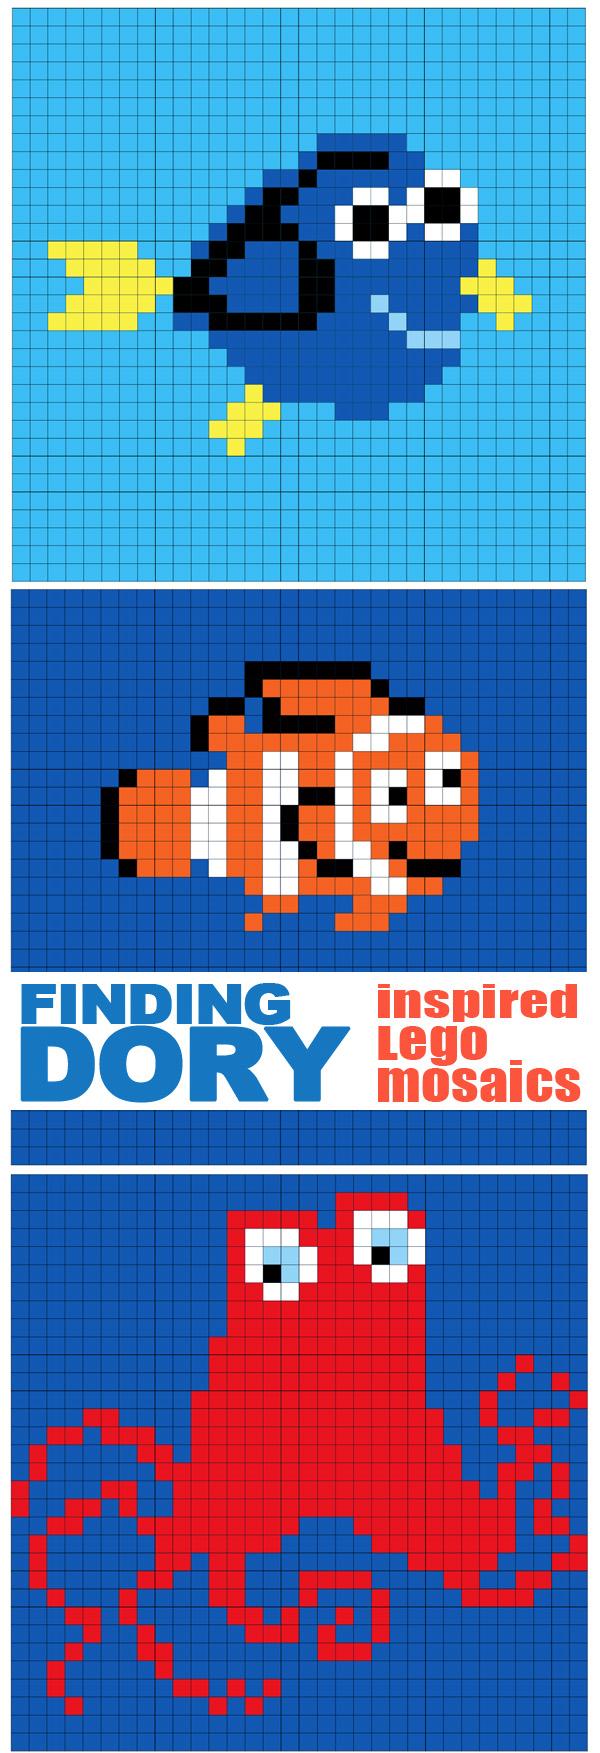 Finding Dory Inspired Lego Mosaics